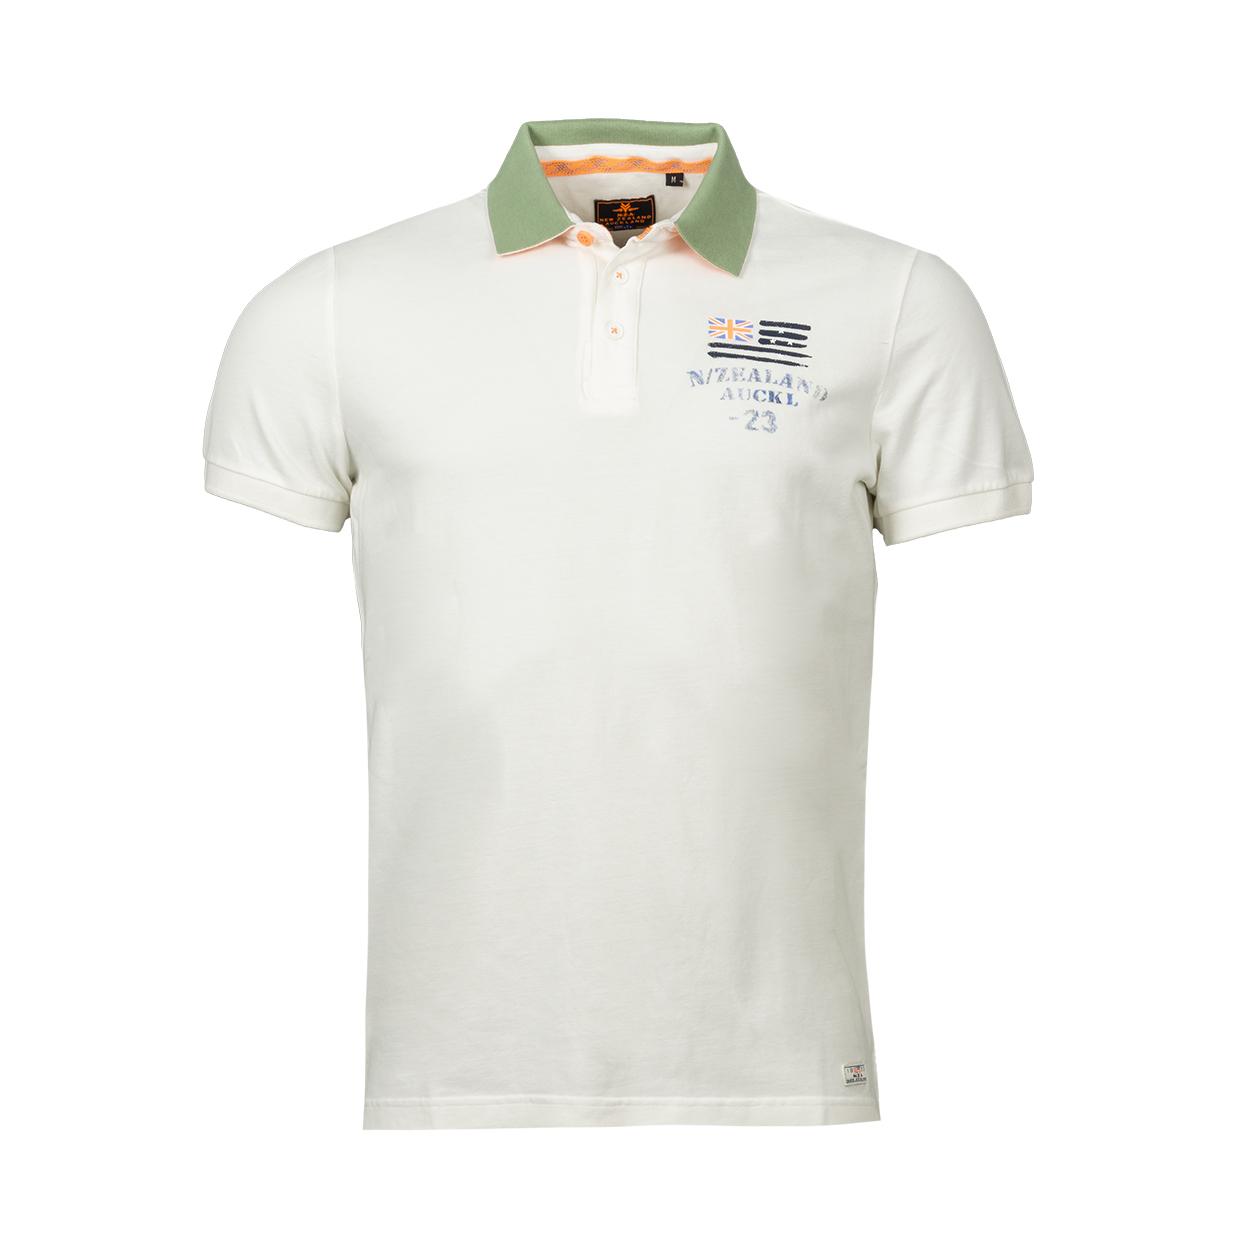 Polo NZA Saxton en coton mélangé blanc et vert kaki